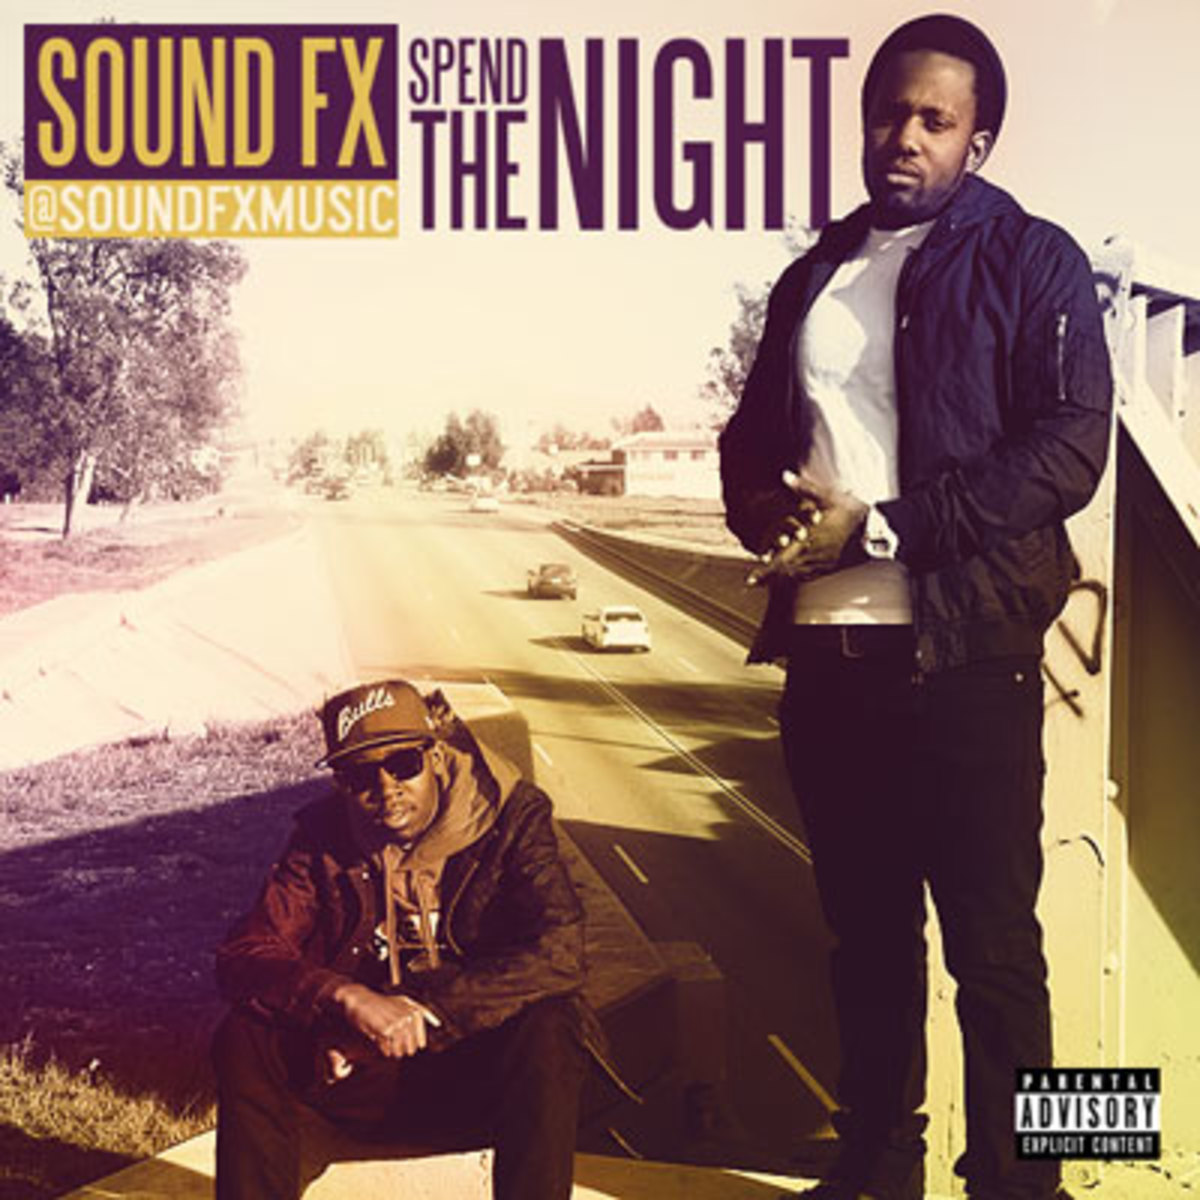 soundfx-spendthenight.jpg